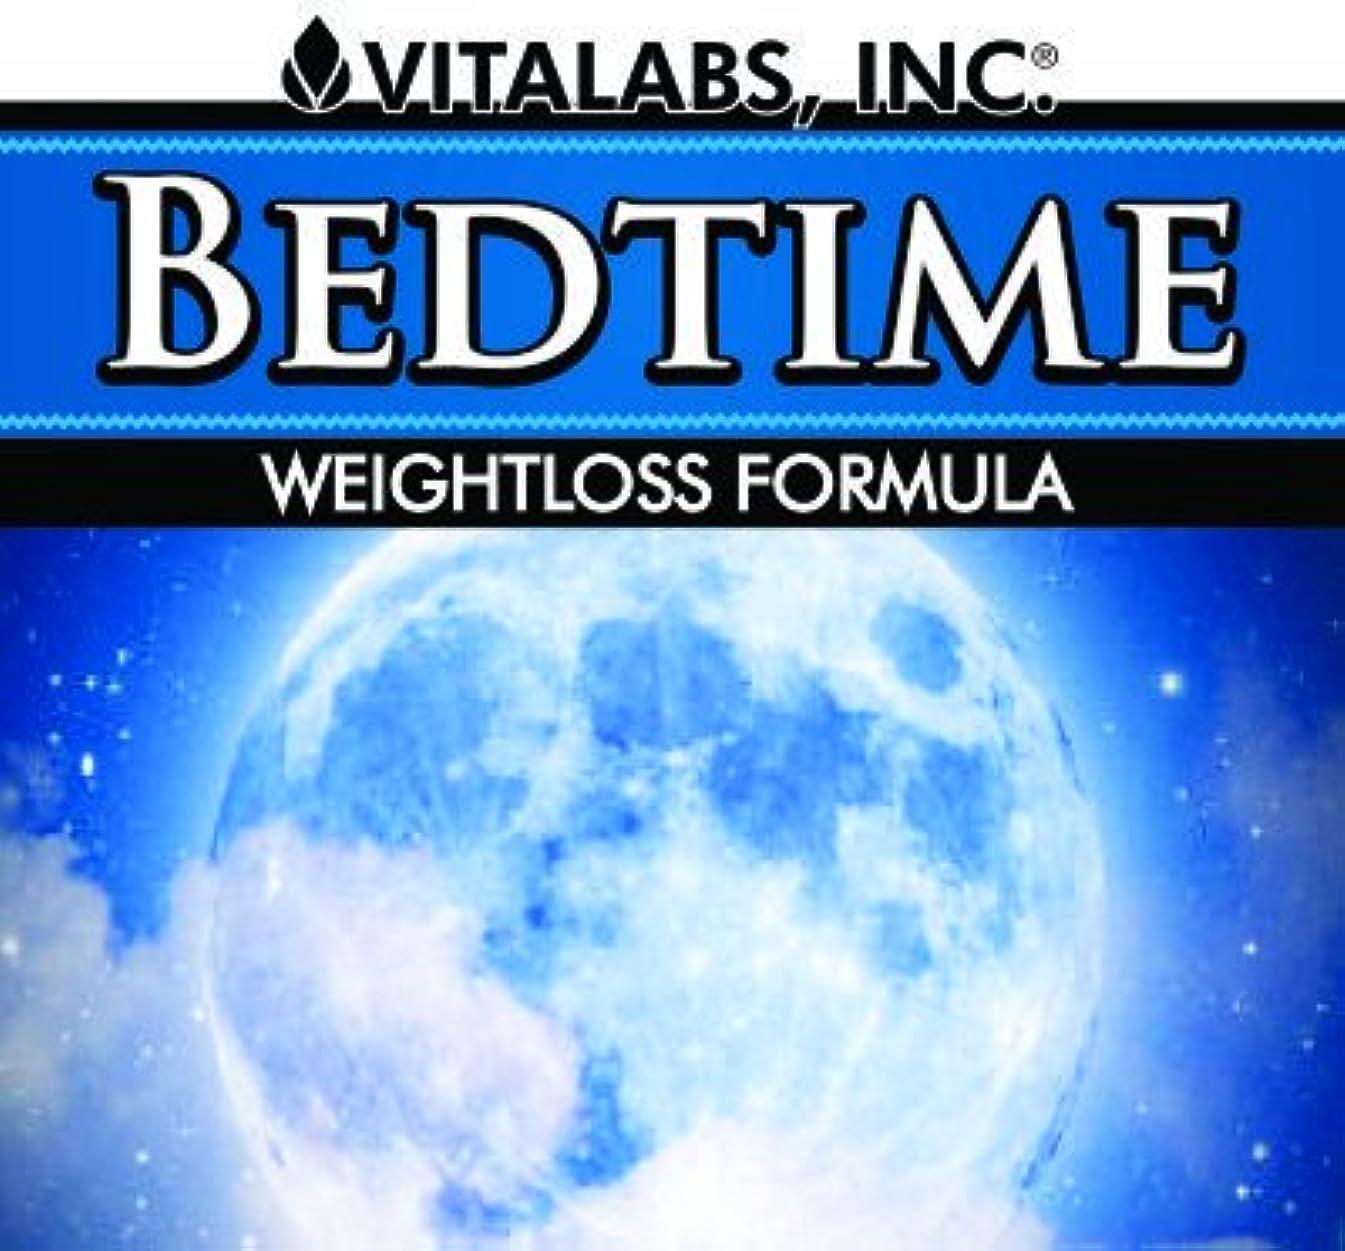 Saturn Supplements/Vitalabs BedTime Weight Lost ベッドタイムウェイトロス 60カプセル